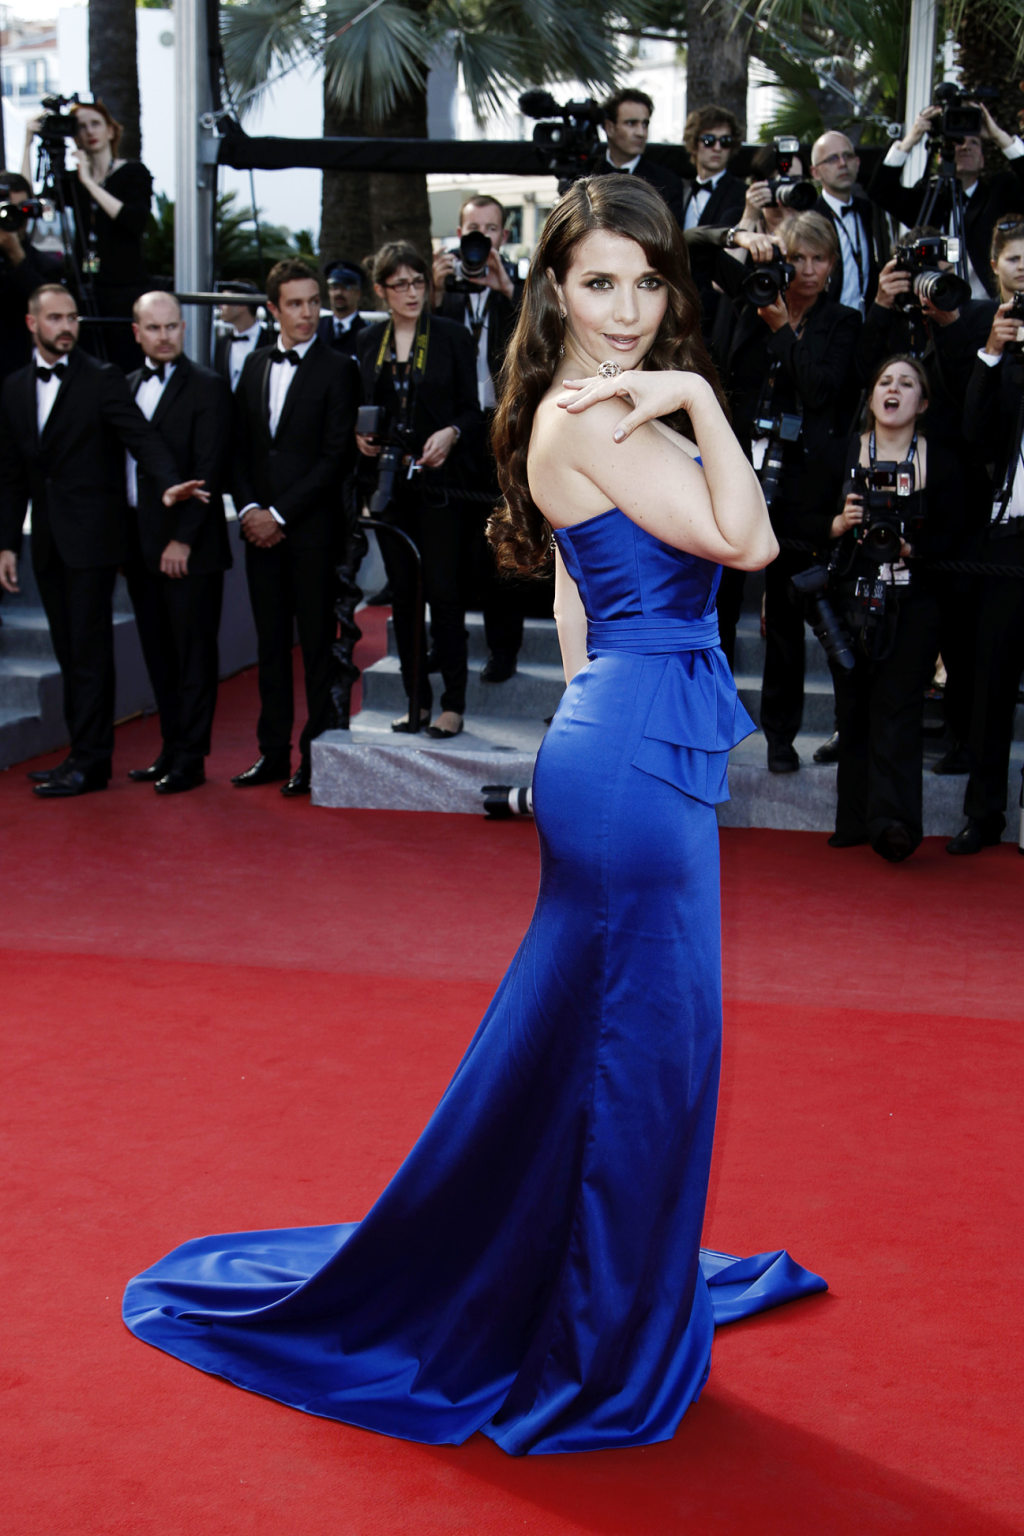 http://1.bp.blogspot.com/-J9HXdSs1Dy0/T75_wzc2AWI/AAAAAAAADmk/CXQhAeYJJ9c/s1600/Natalia+Oreiro+Cannes+%25284%2529.jpeg